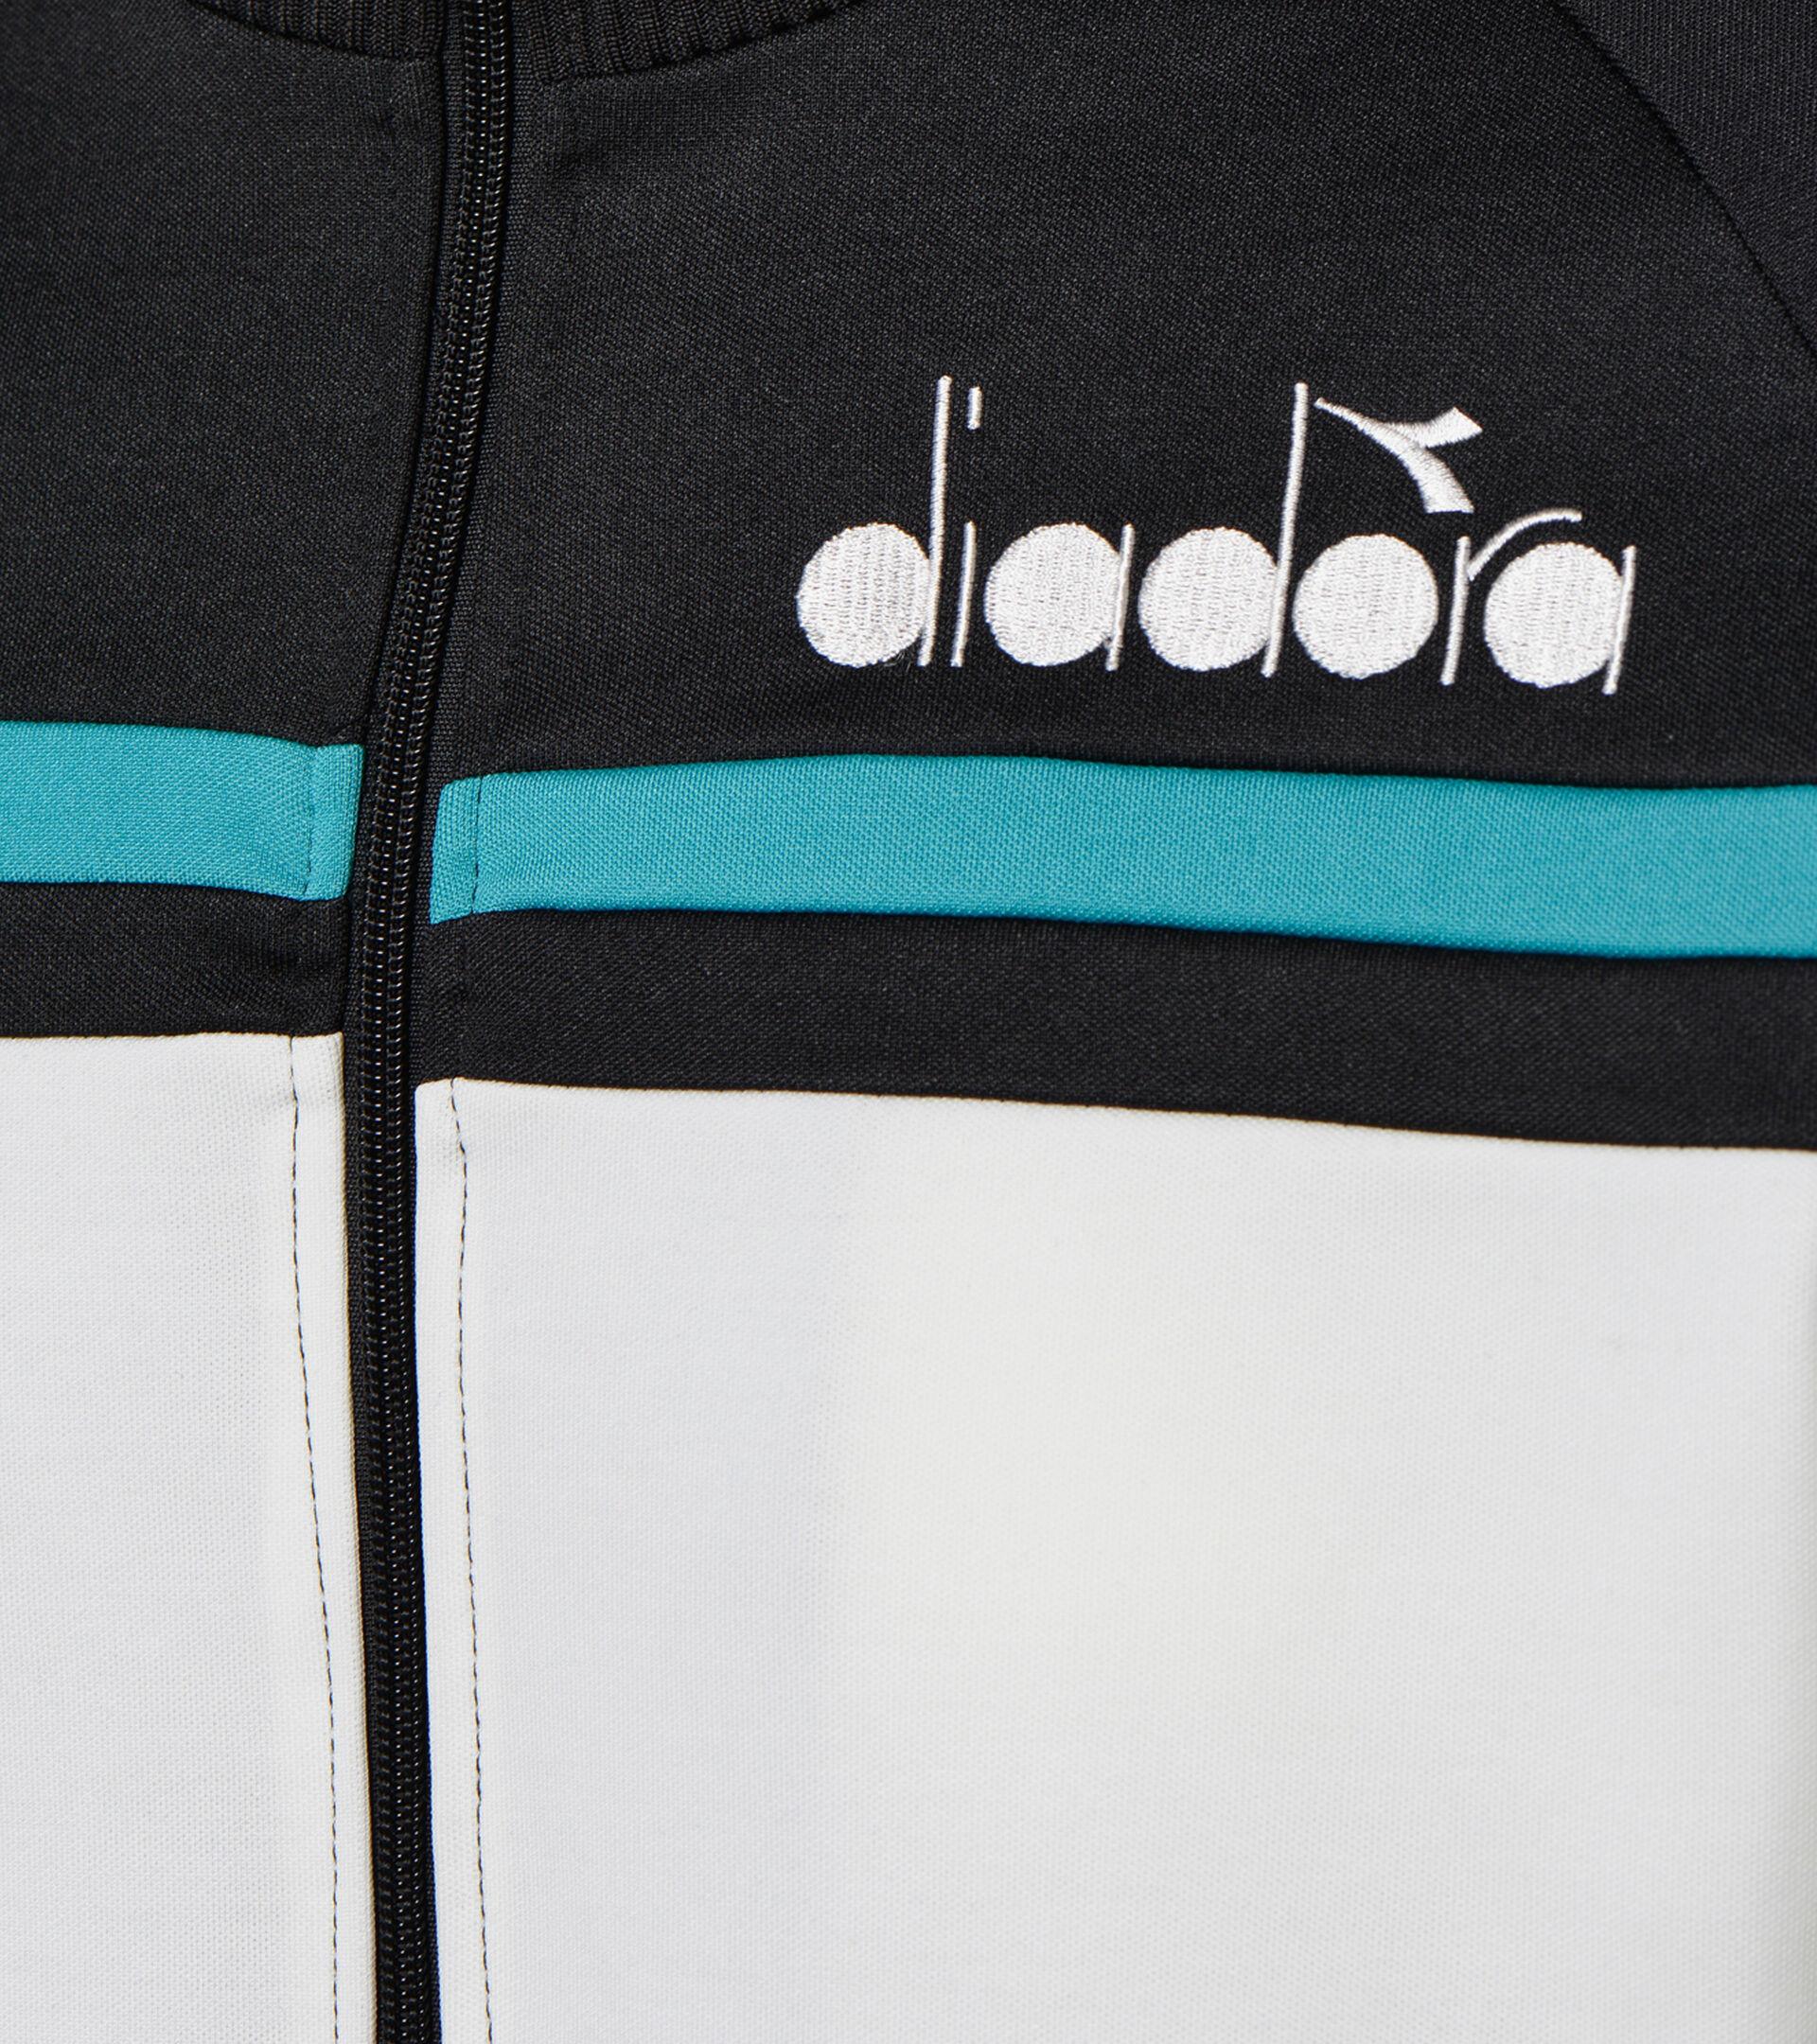 Apparel Sportswear UOMO JACKET 80S BLACK/ACQUA GREEN/WHITE MILK Diadora